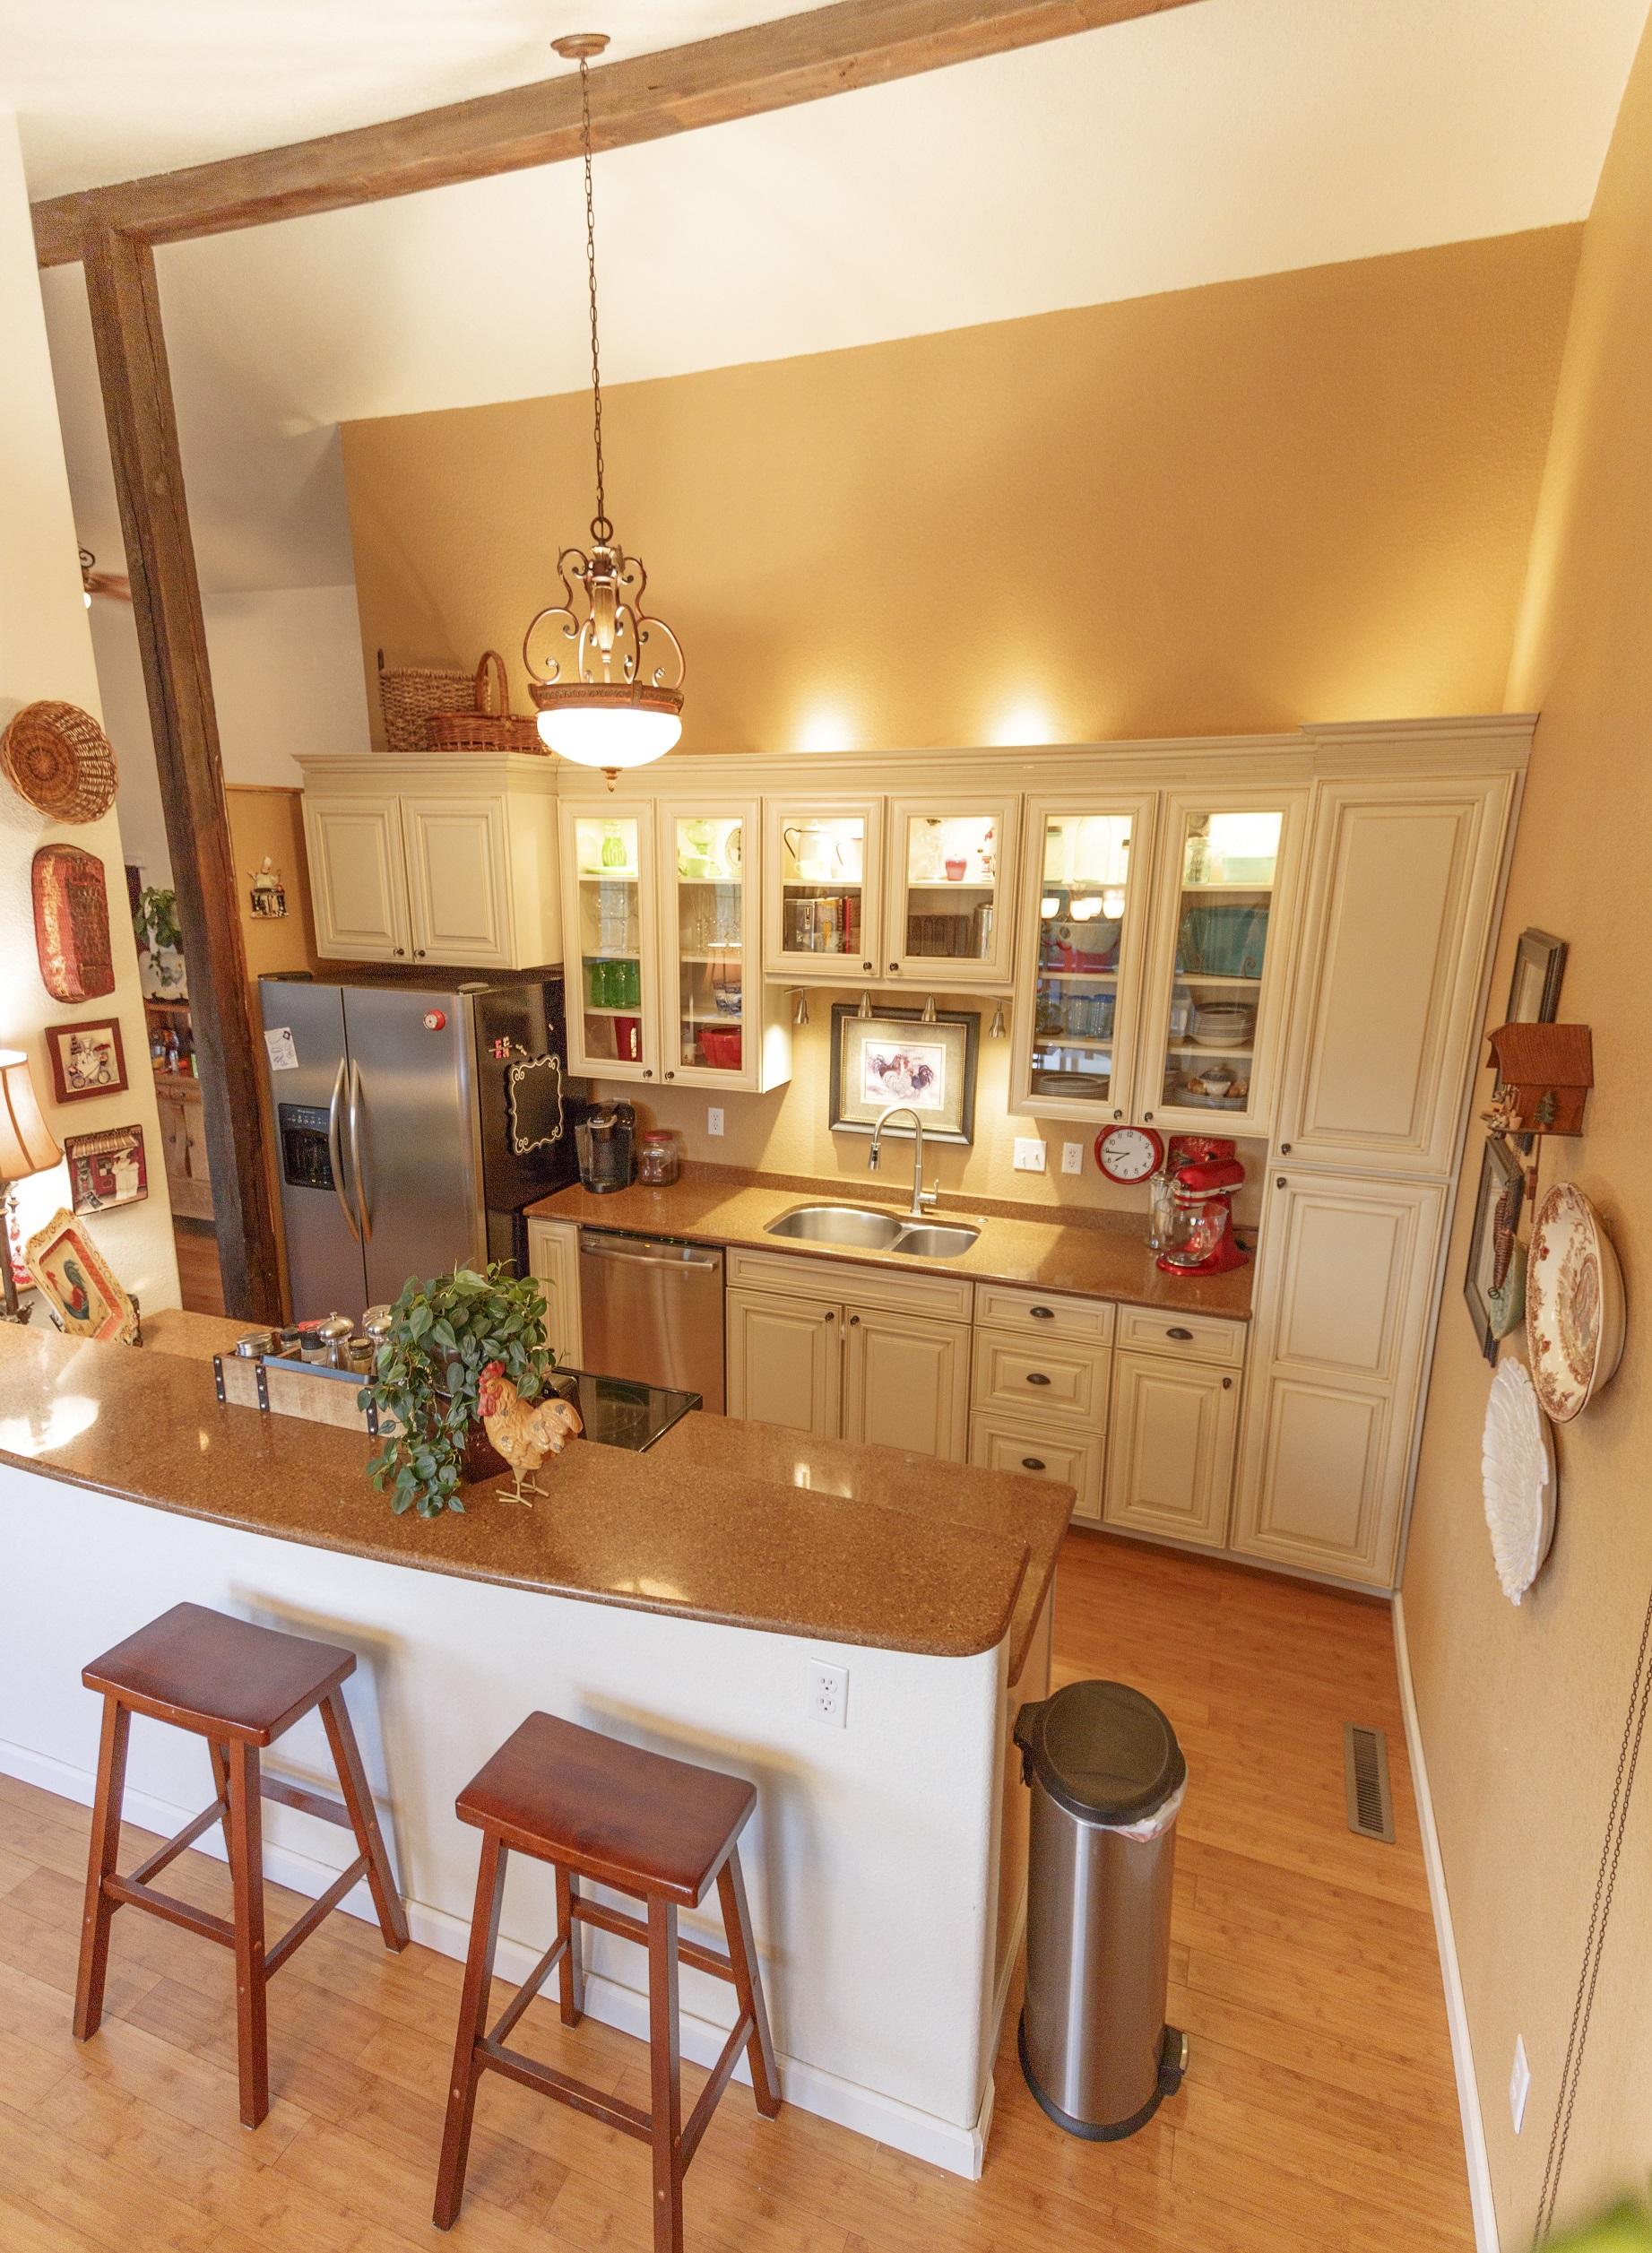 b5z Kitchen 3 small